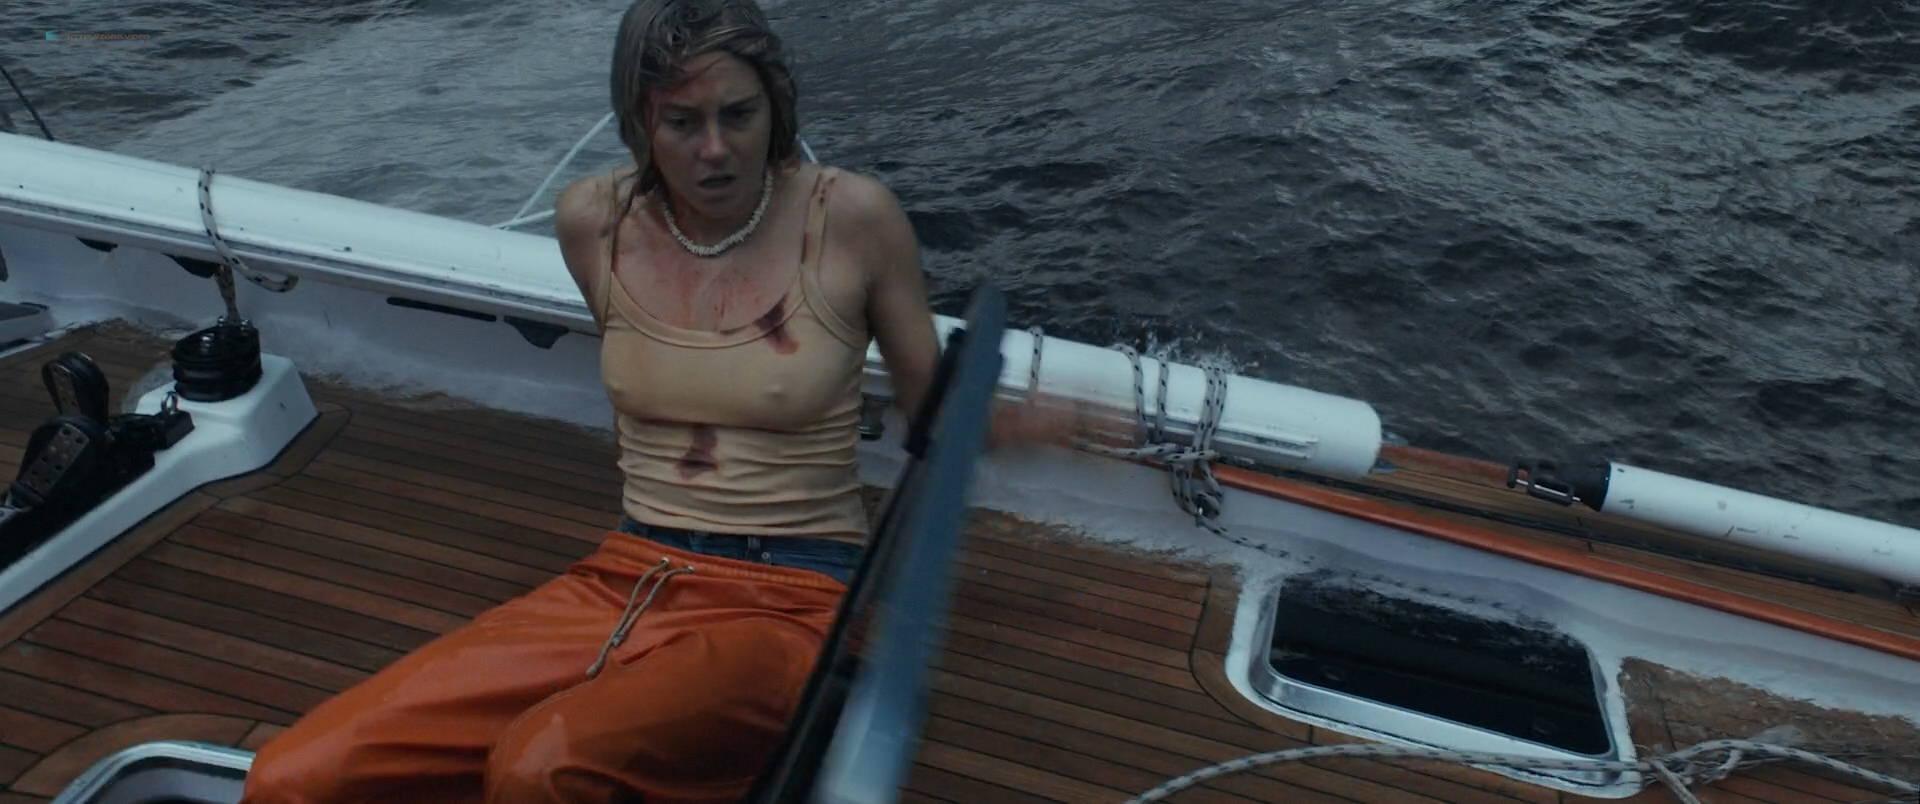 Shailene Woodley Nude Adrift